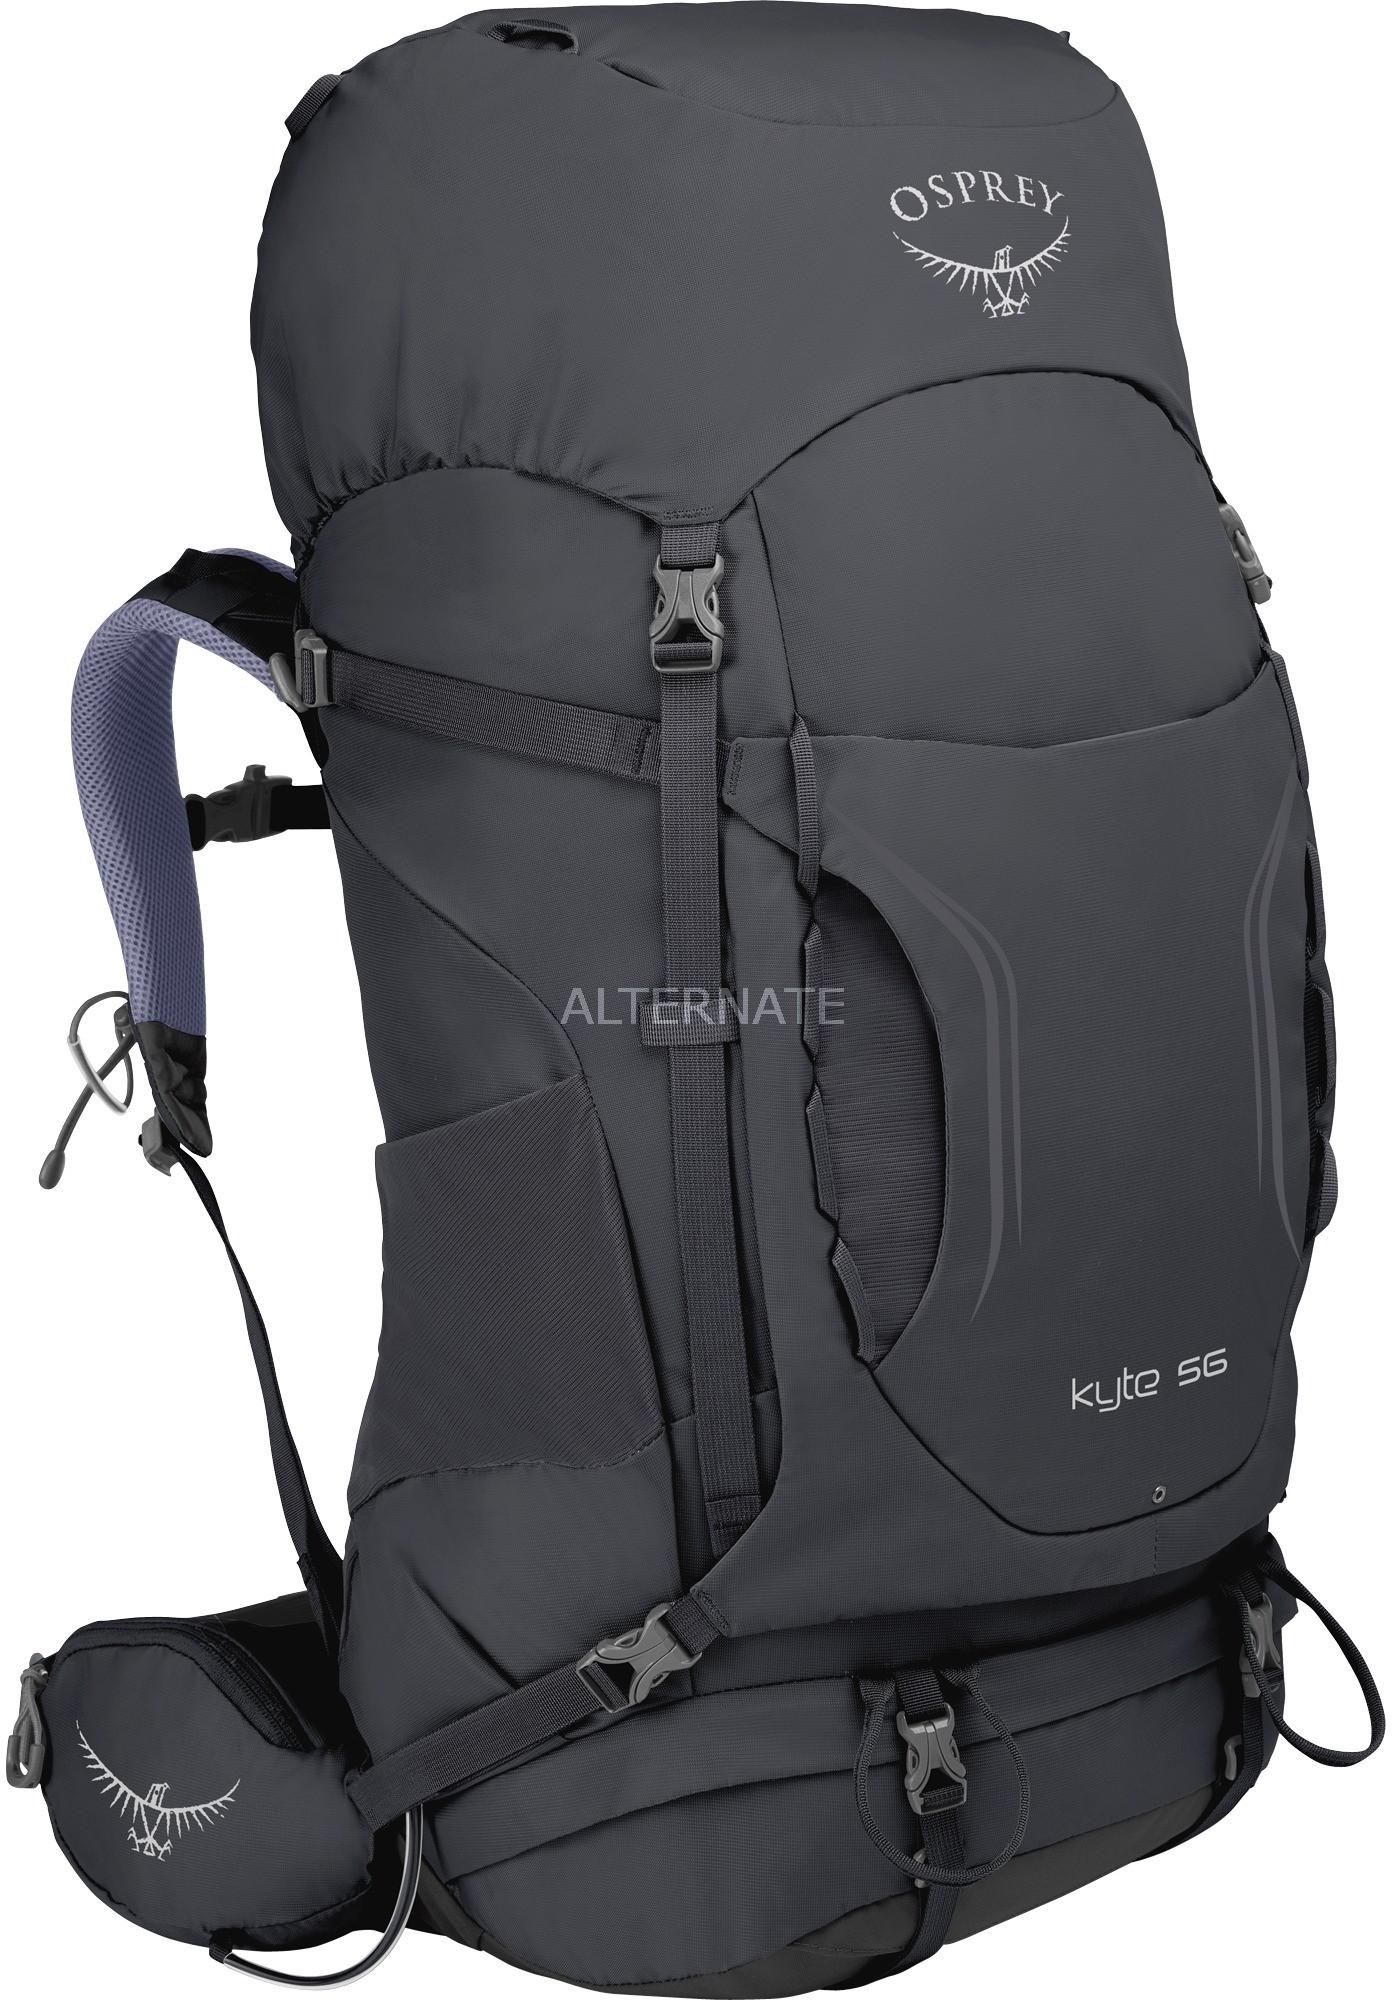 Osprey Kyte 56, Plecak 0843820108491